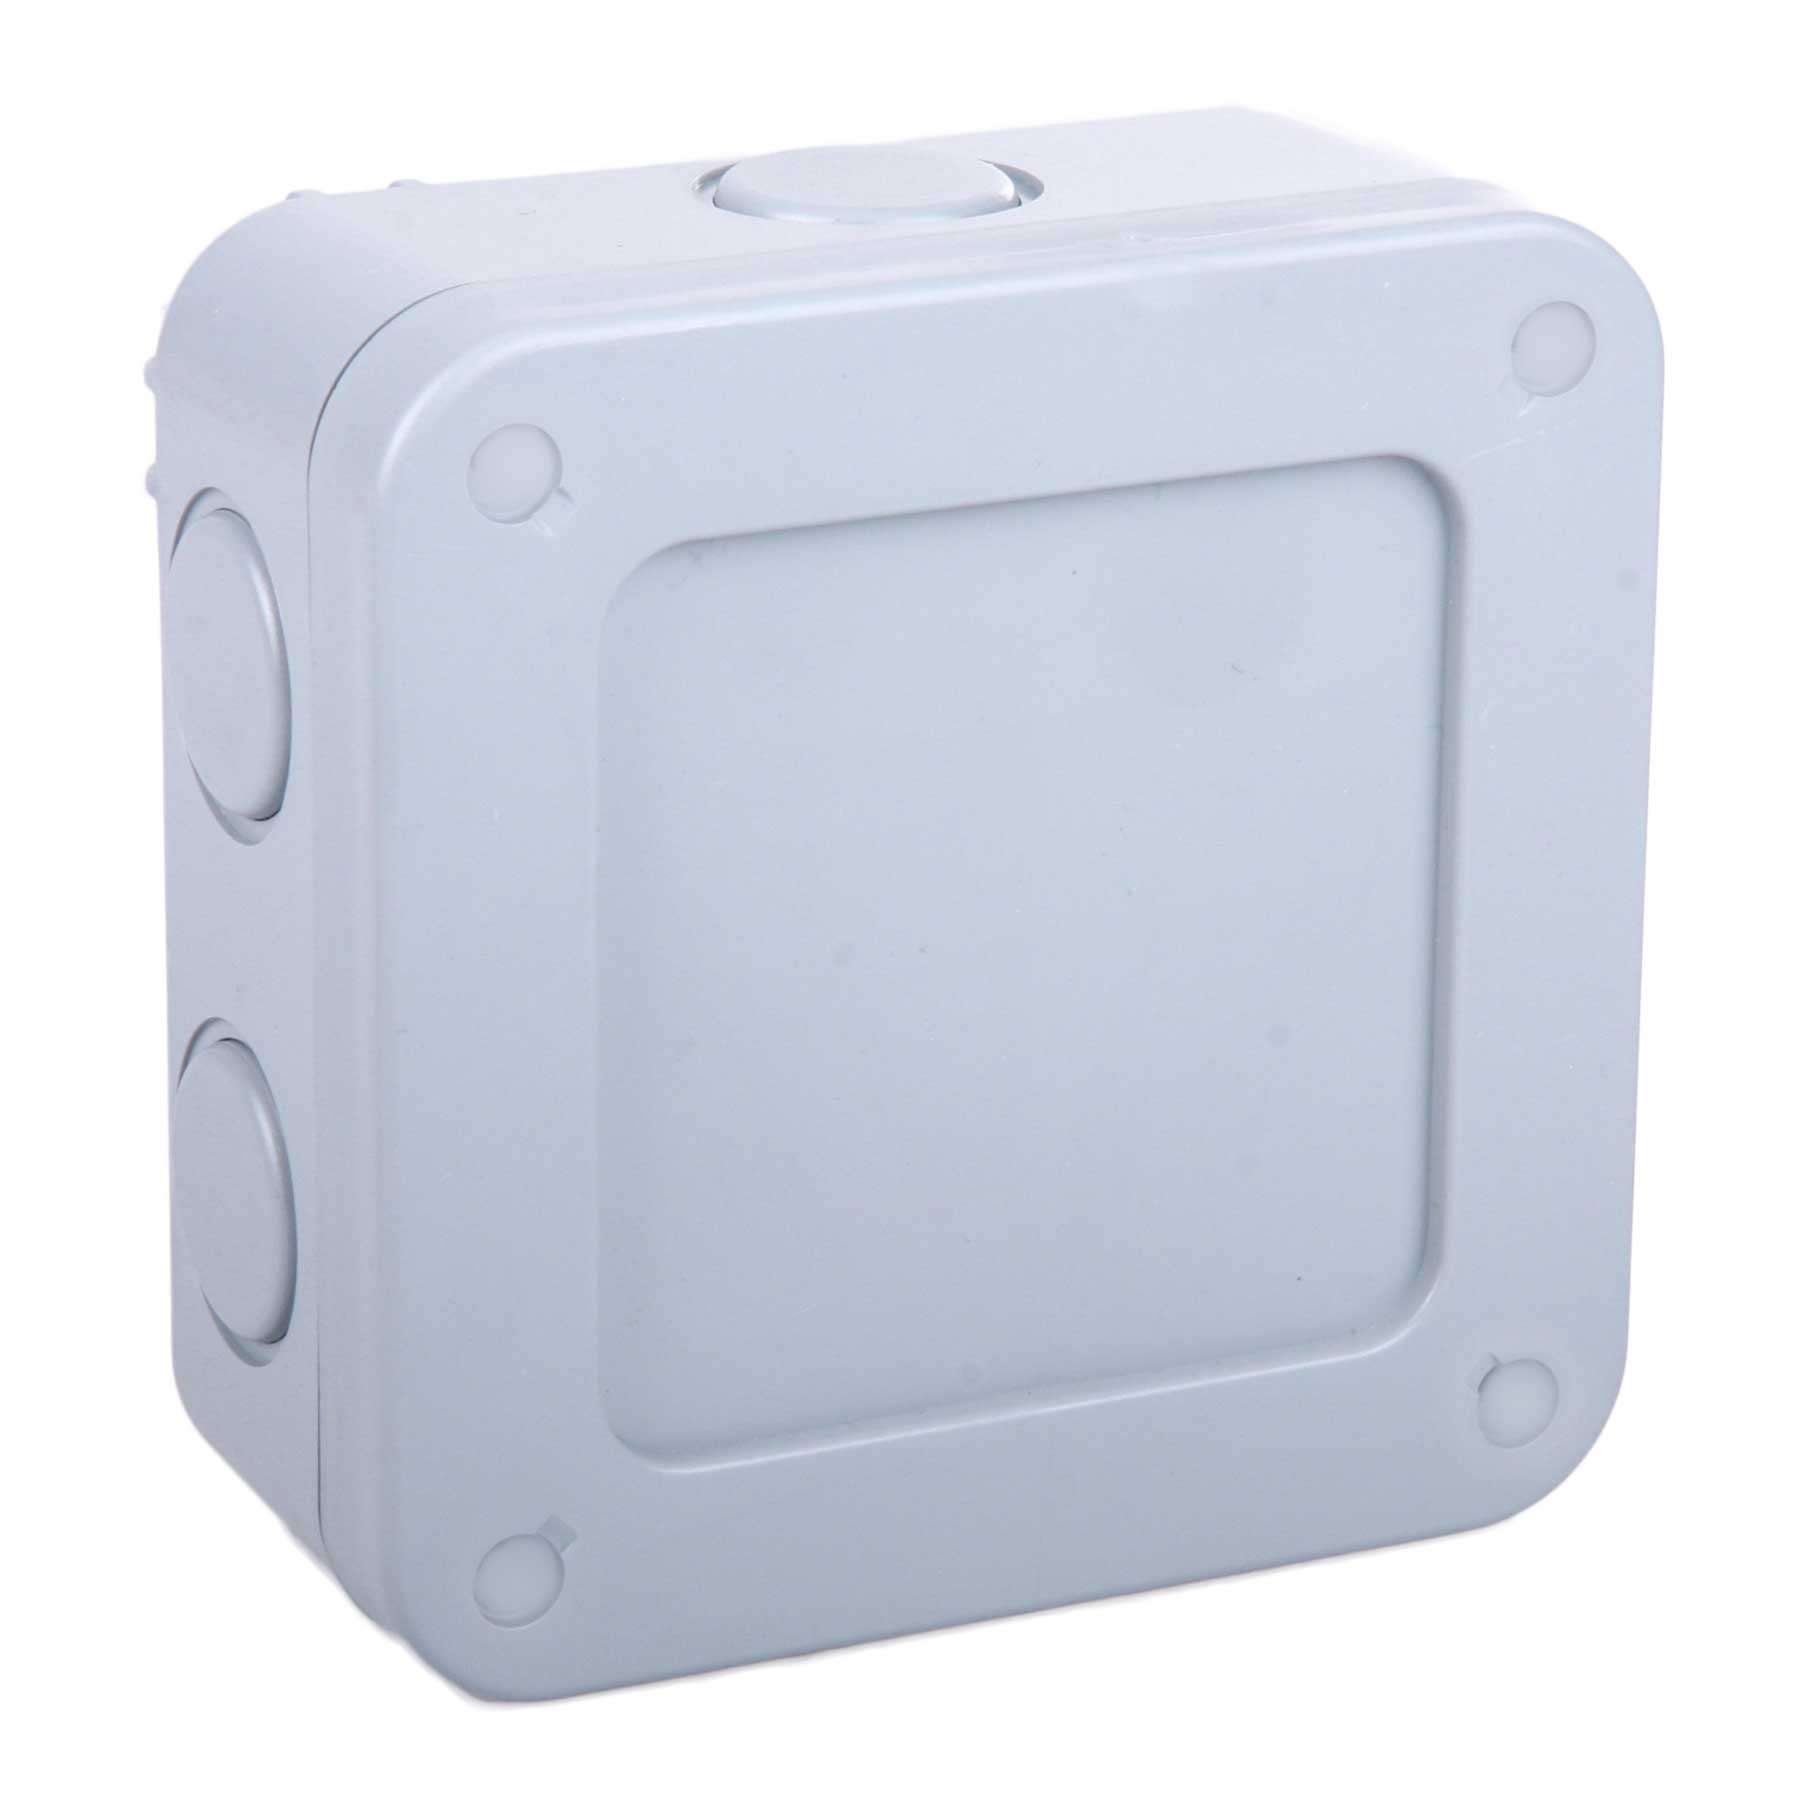 Masterplug Weatherproof Outdoor Junction Box 5 Pole